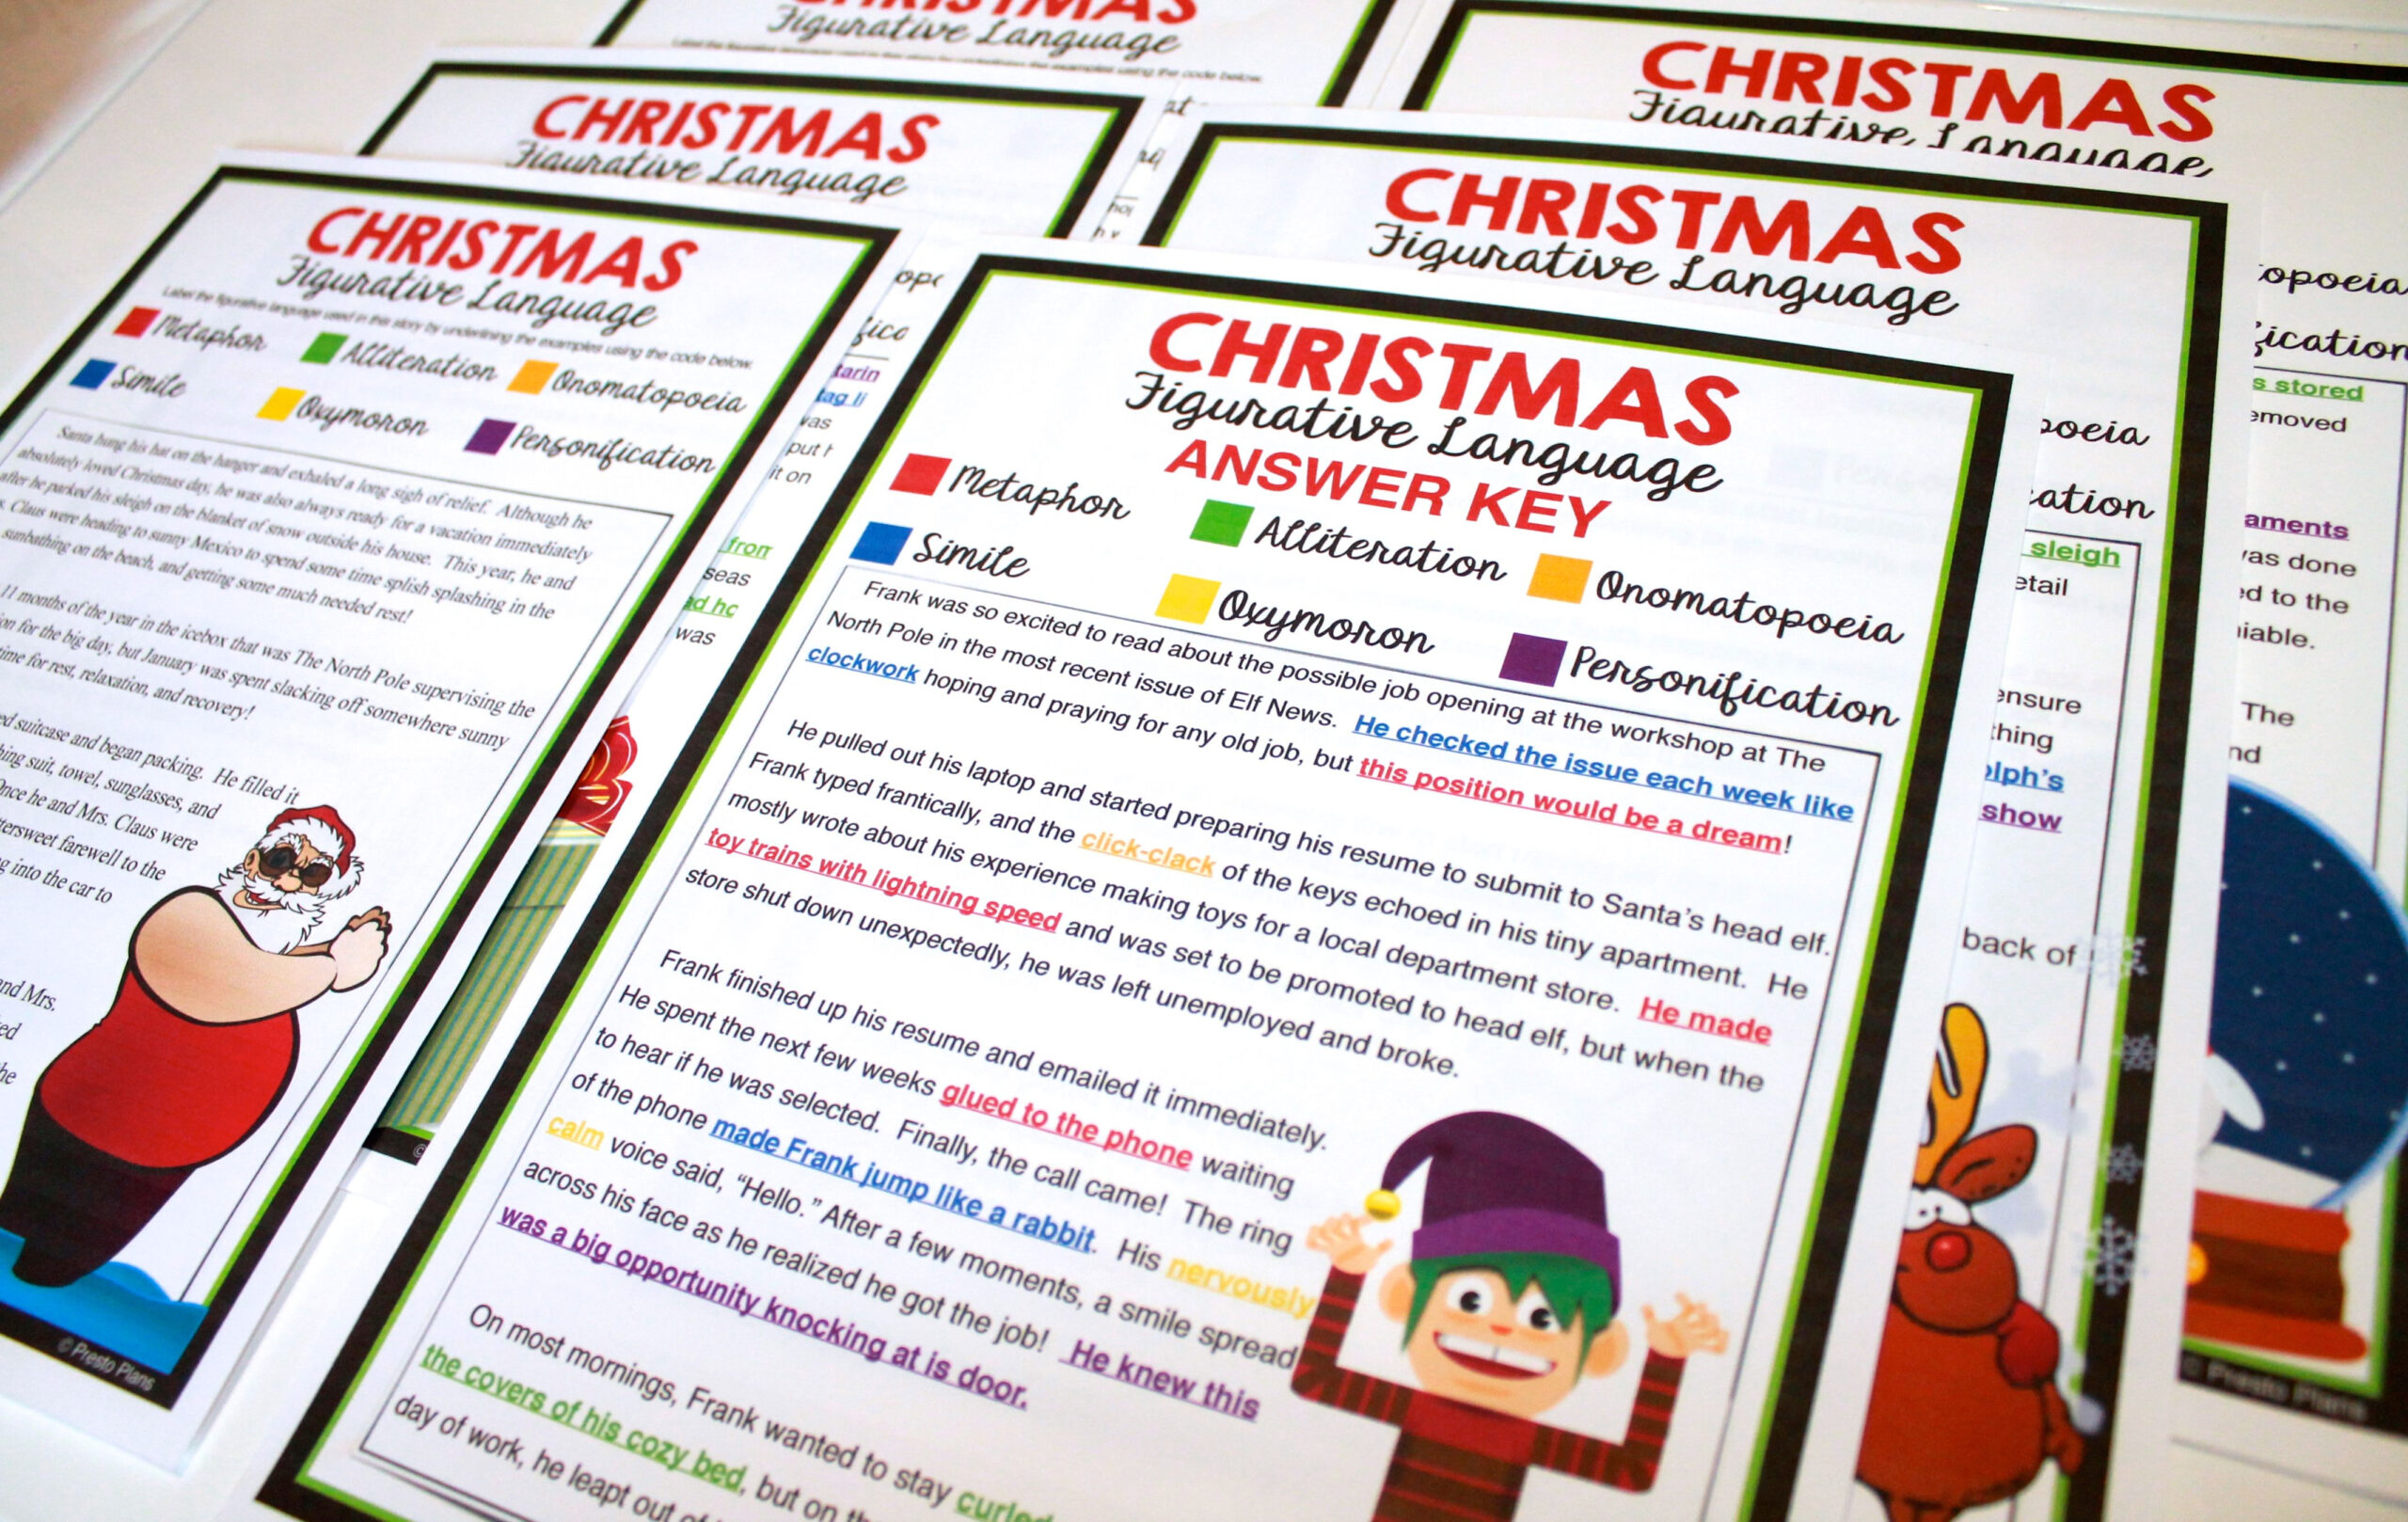 Christmas Figurative Language - 5 Stories   Figurative